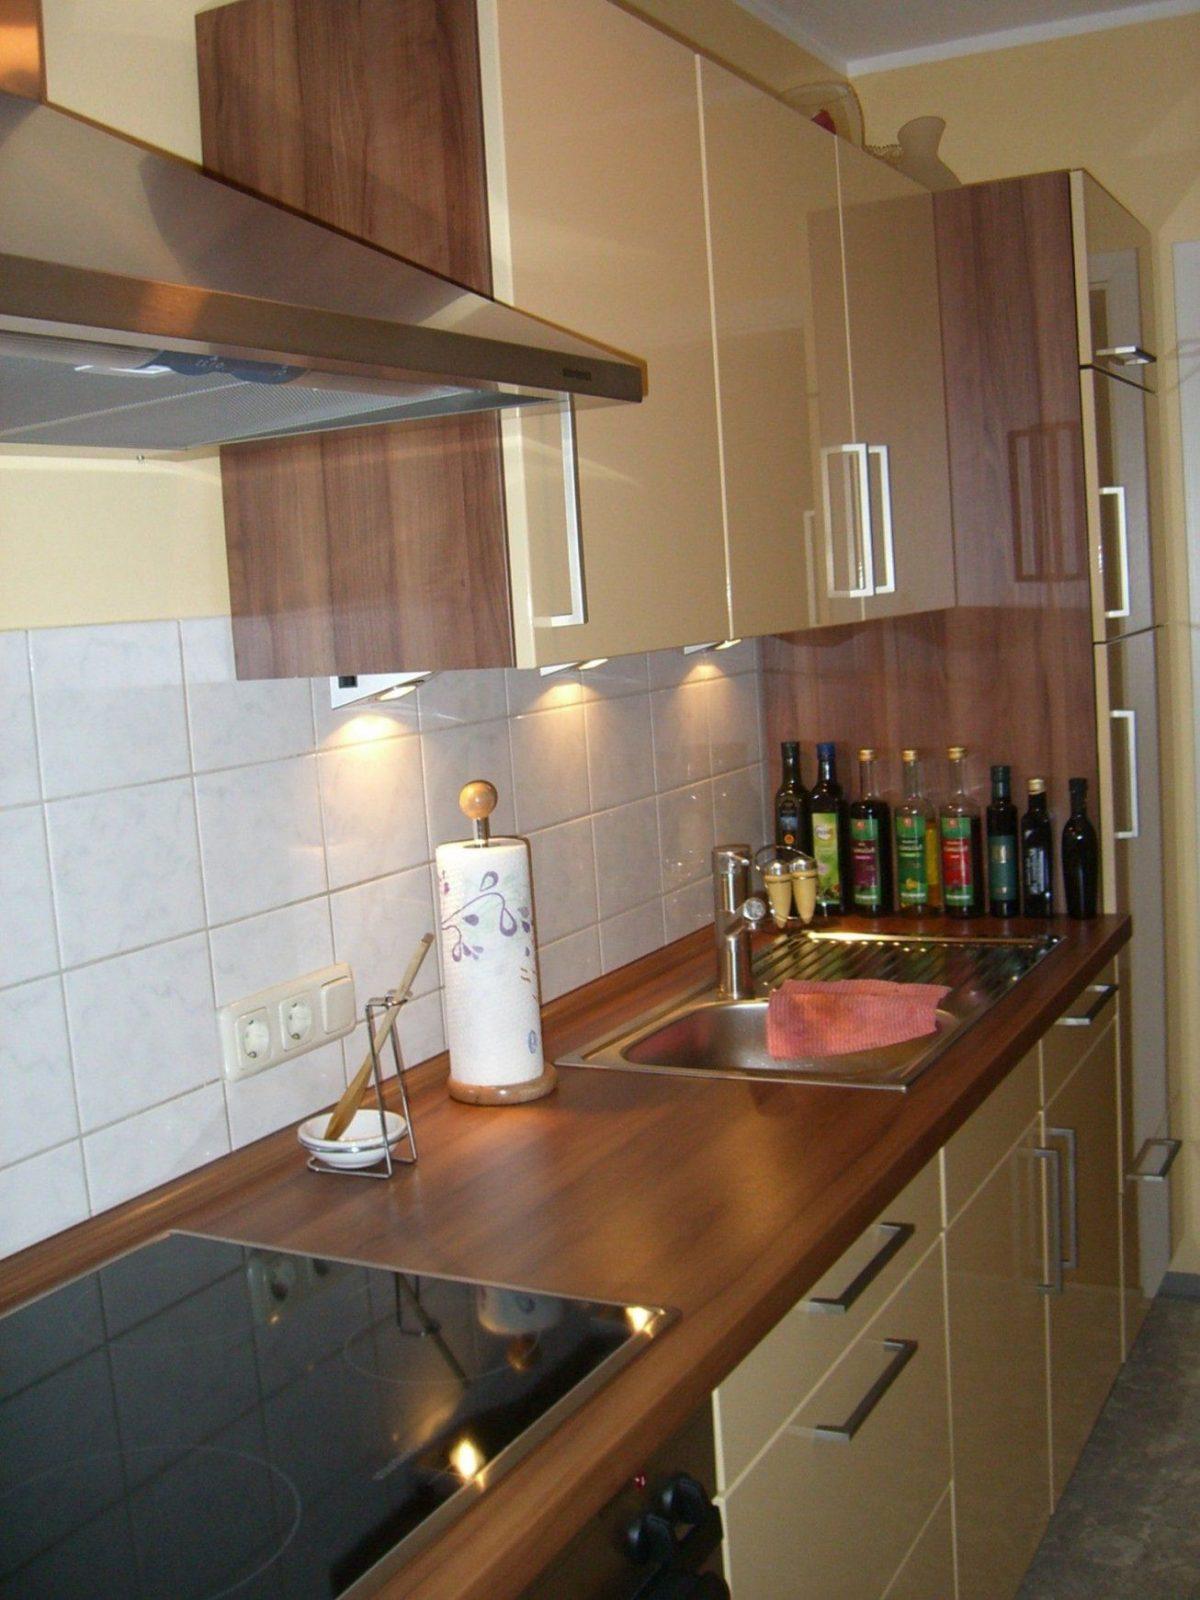 Appealing Leiste Arbeitsplatte U Swalif Pic Of Leisten Fuer von Leiste Für Arbeitsplatte Küche Photo